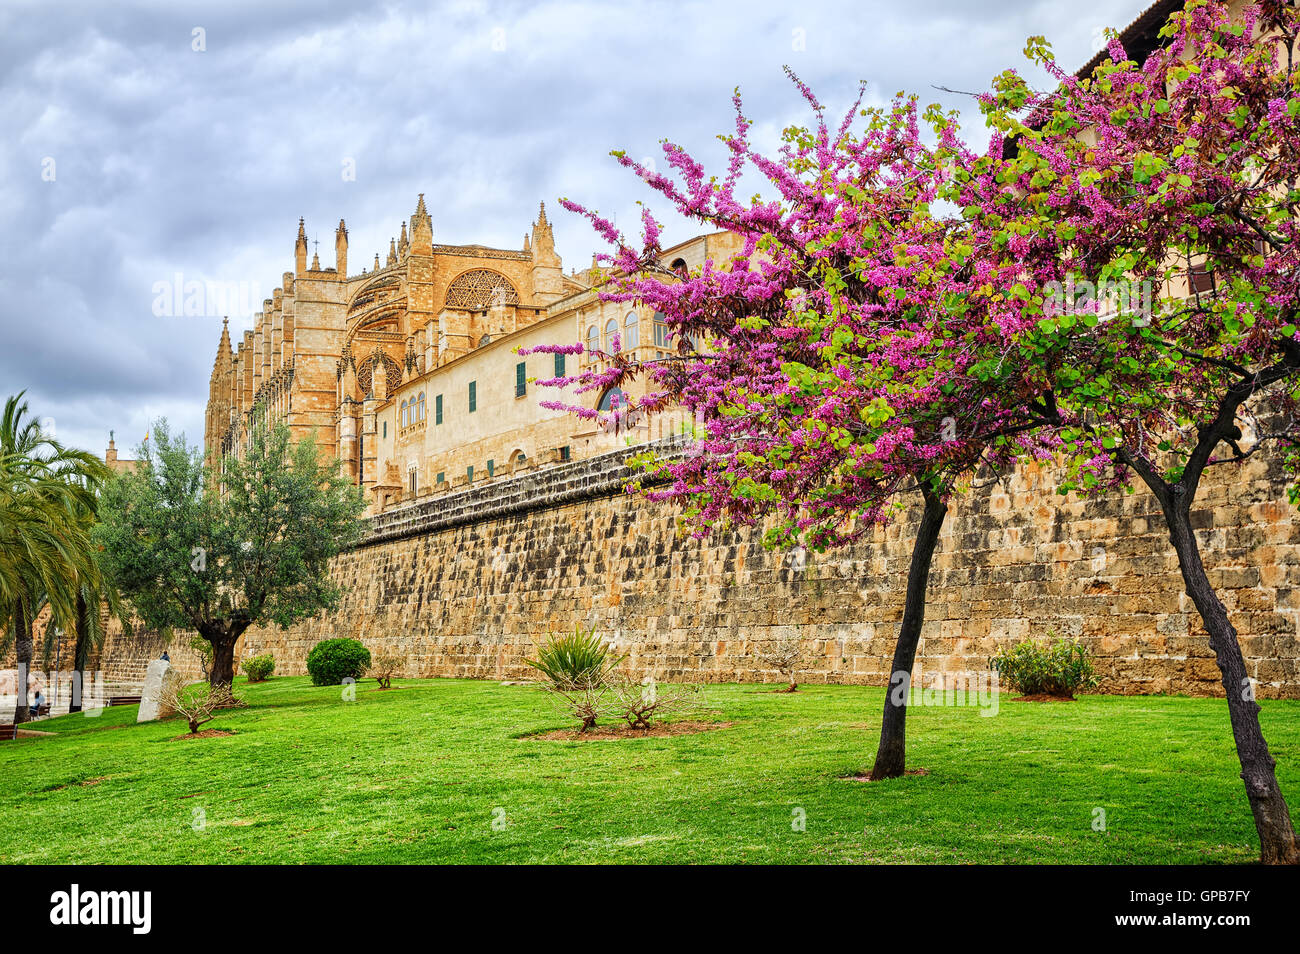 Cerezo en Flor roja delante de La Seu, la catedral de Palma de Mallorca, España Imagen De Stock